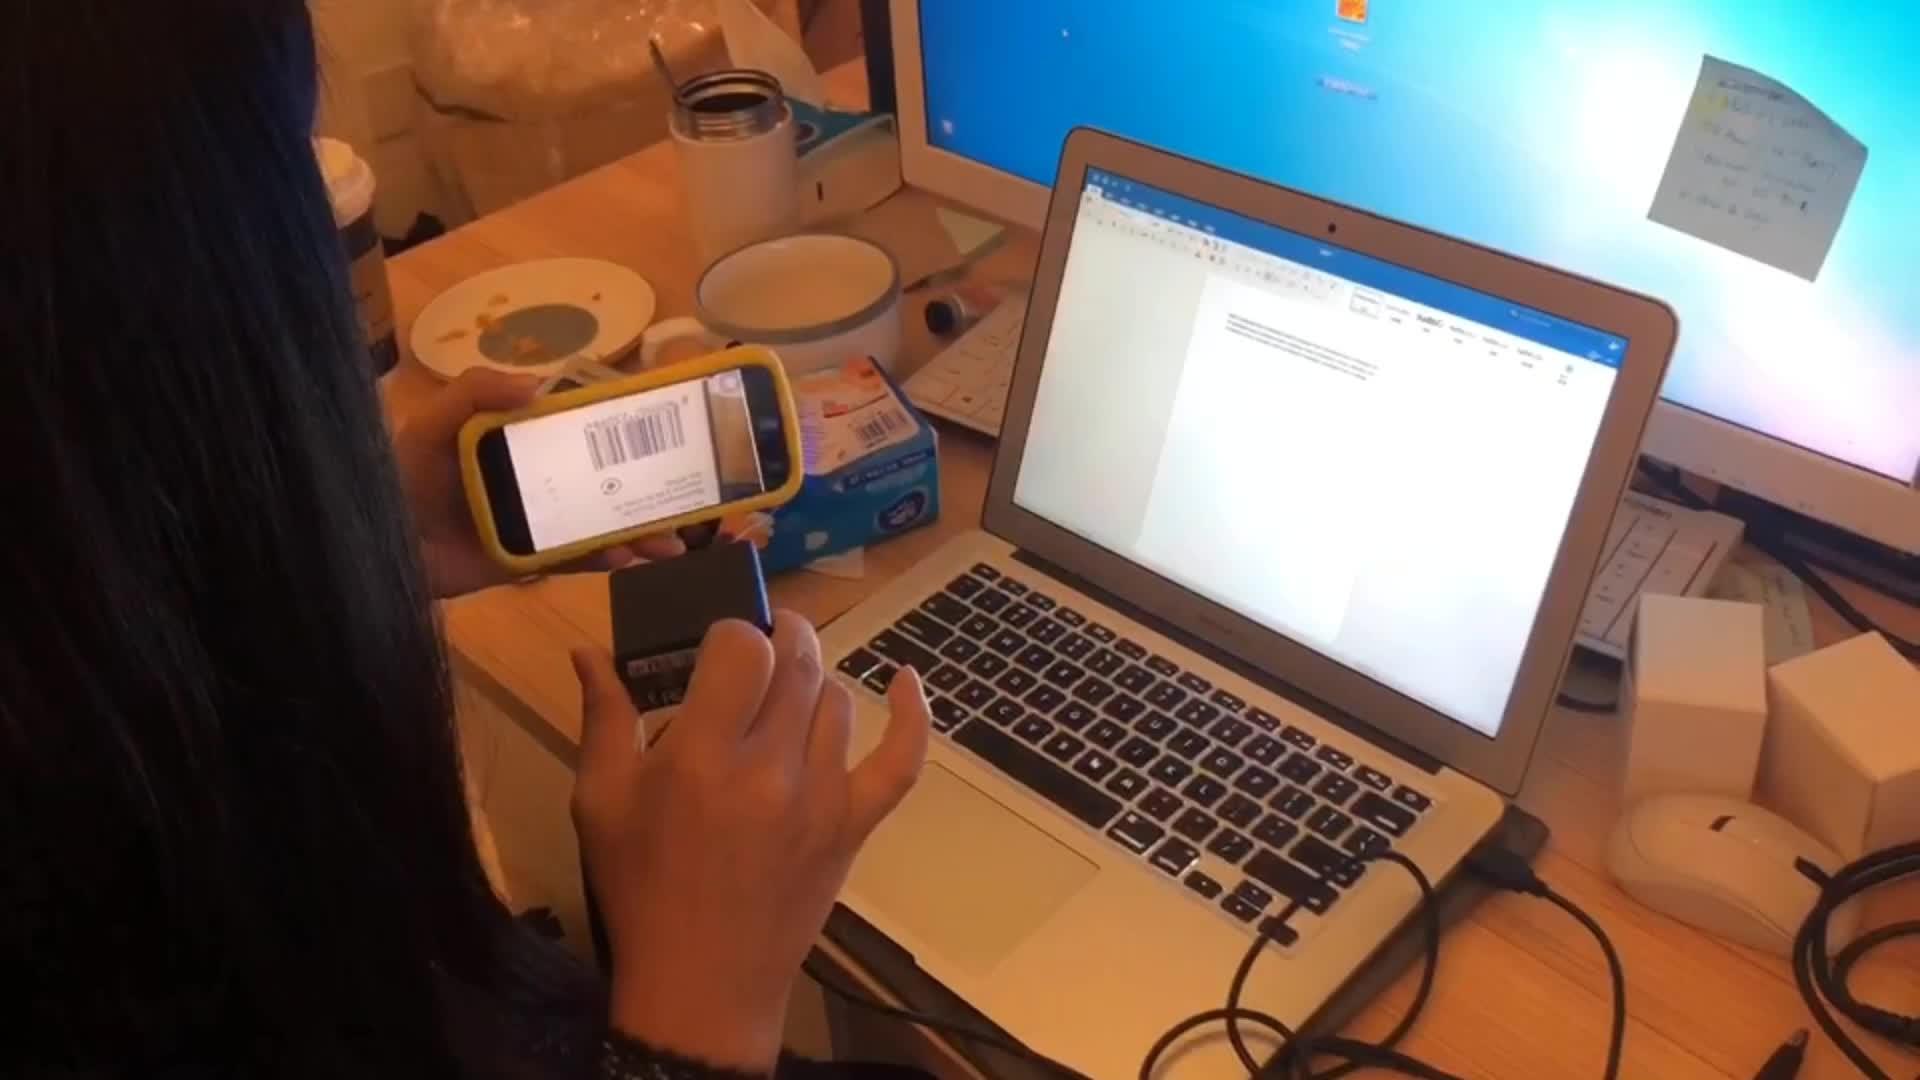 1D และ 2D Barcode Scanner USB CMOS รหัส Reader Kiosk ตู้หยอดเหรียญ Barcode ประตูล็อค